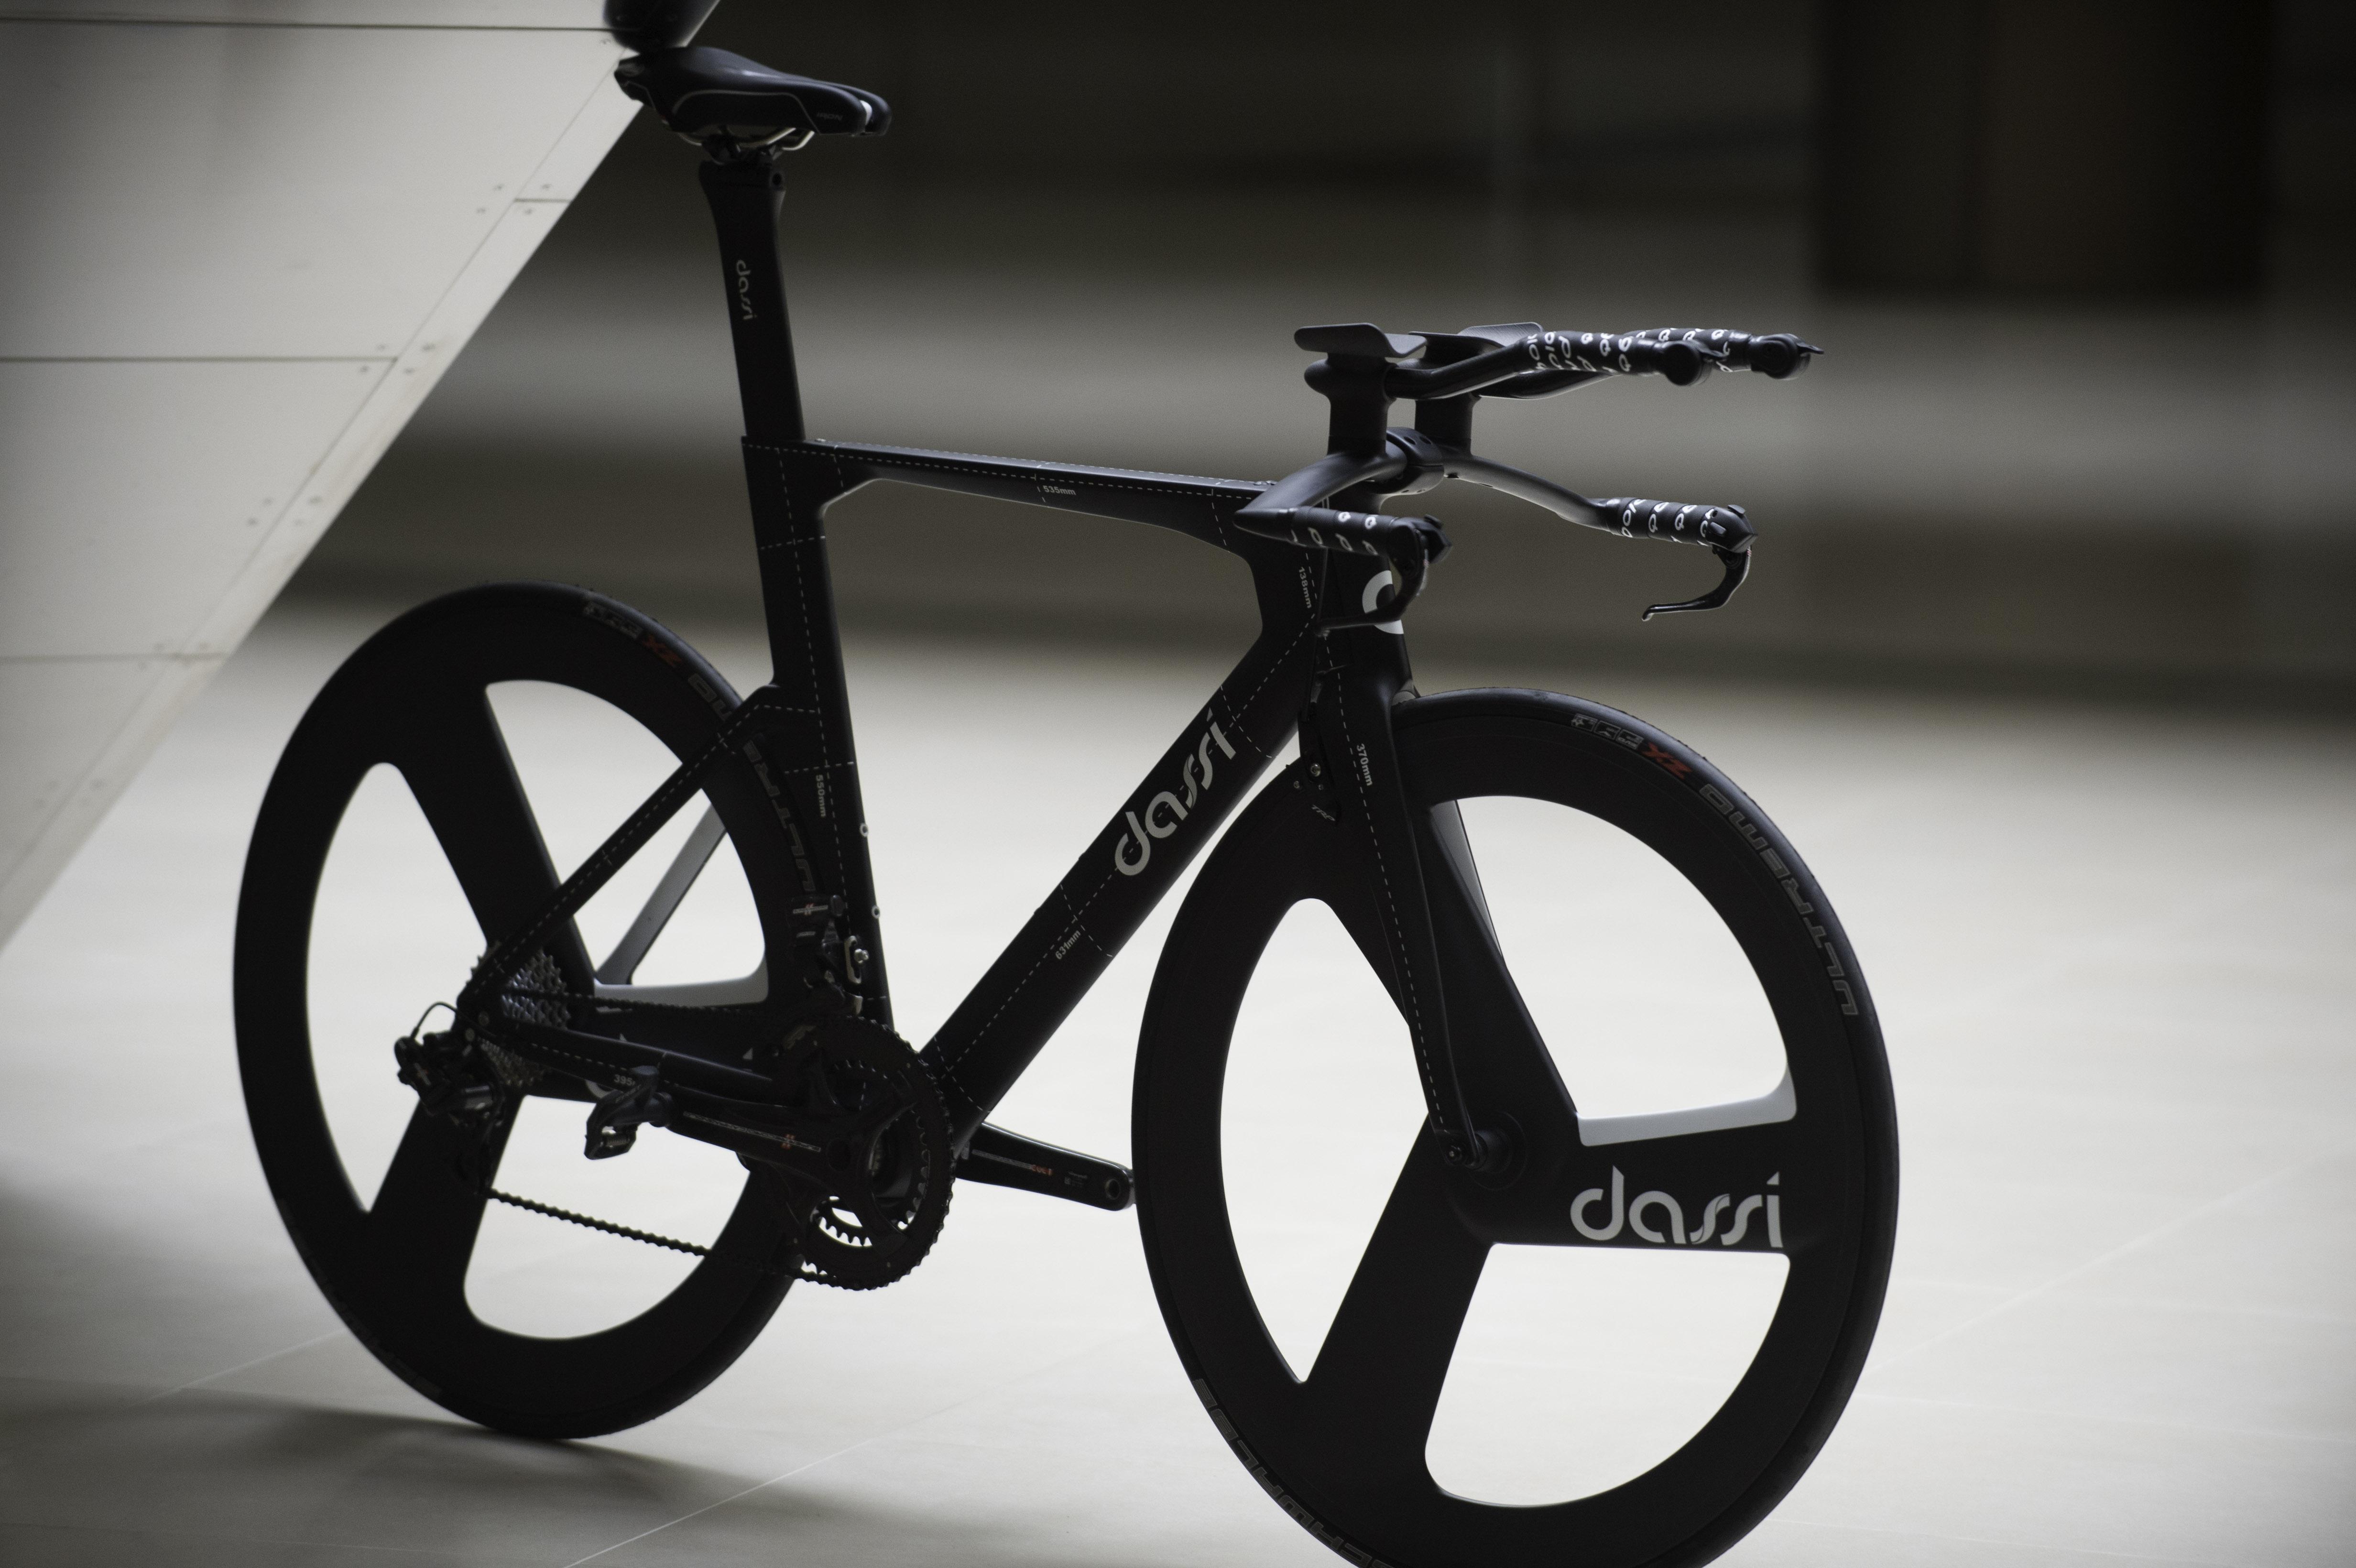 Sponge Marketing Dassi Bikes